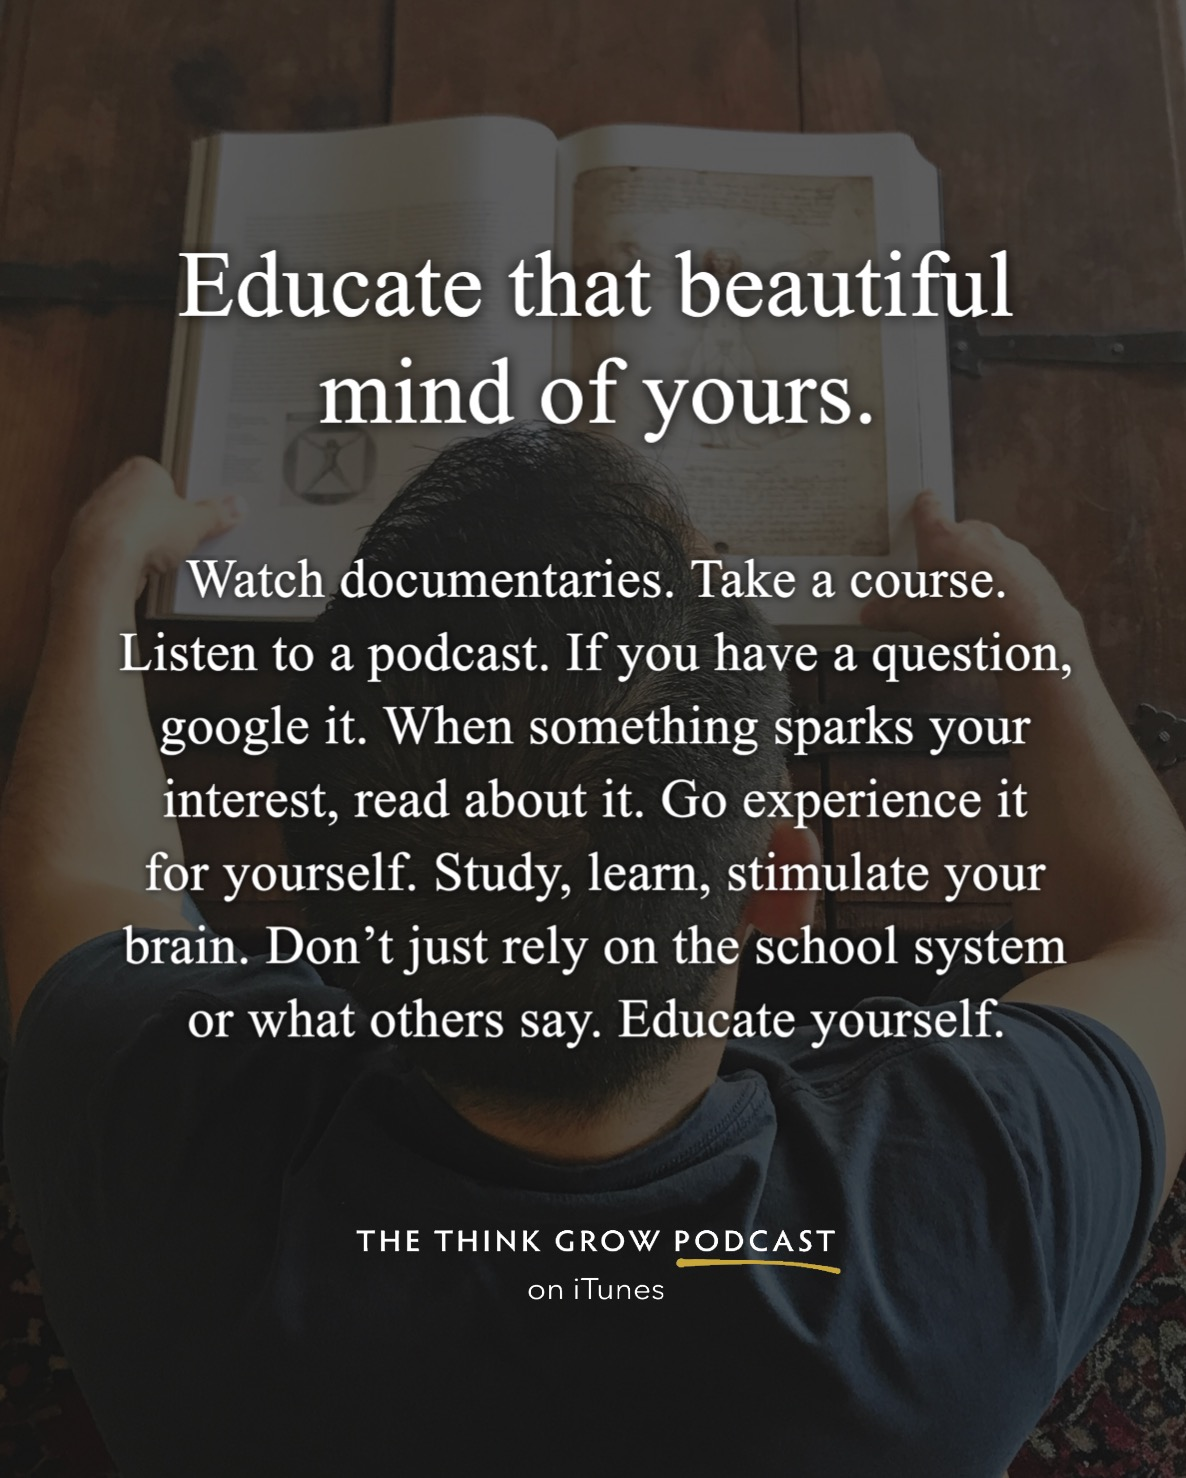 educate that beautiful mind (1).JPG